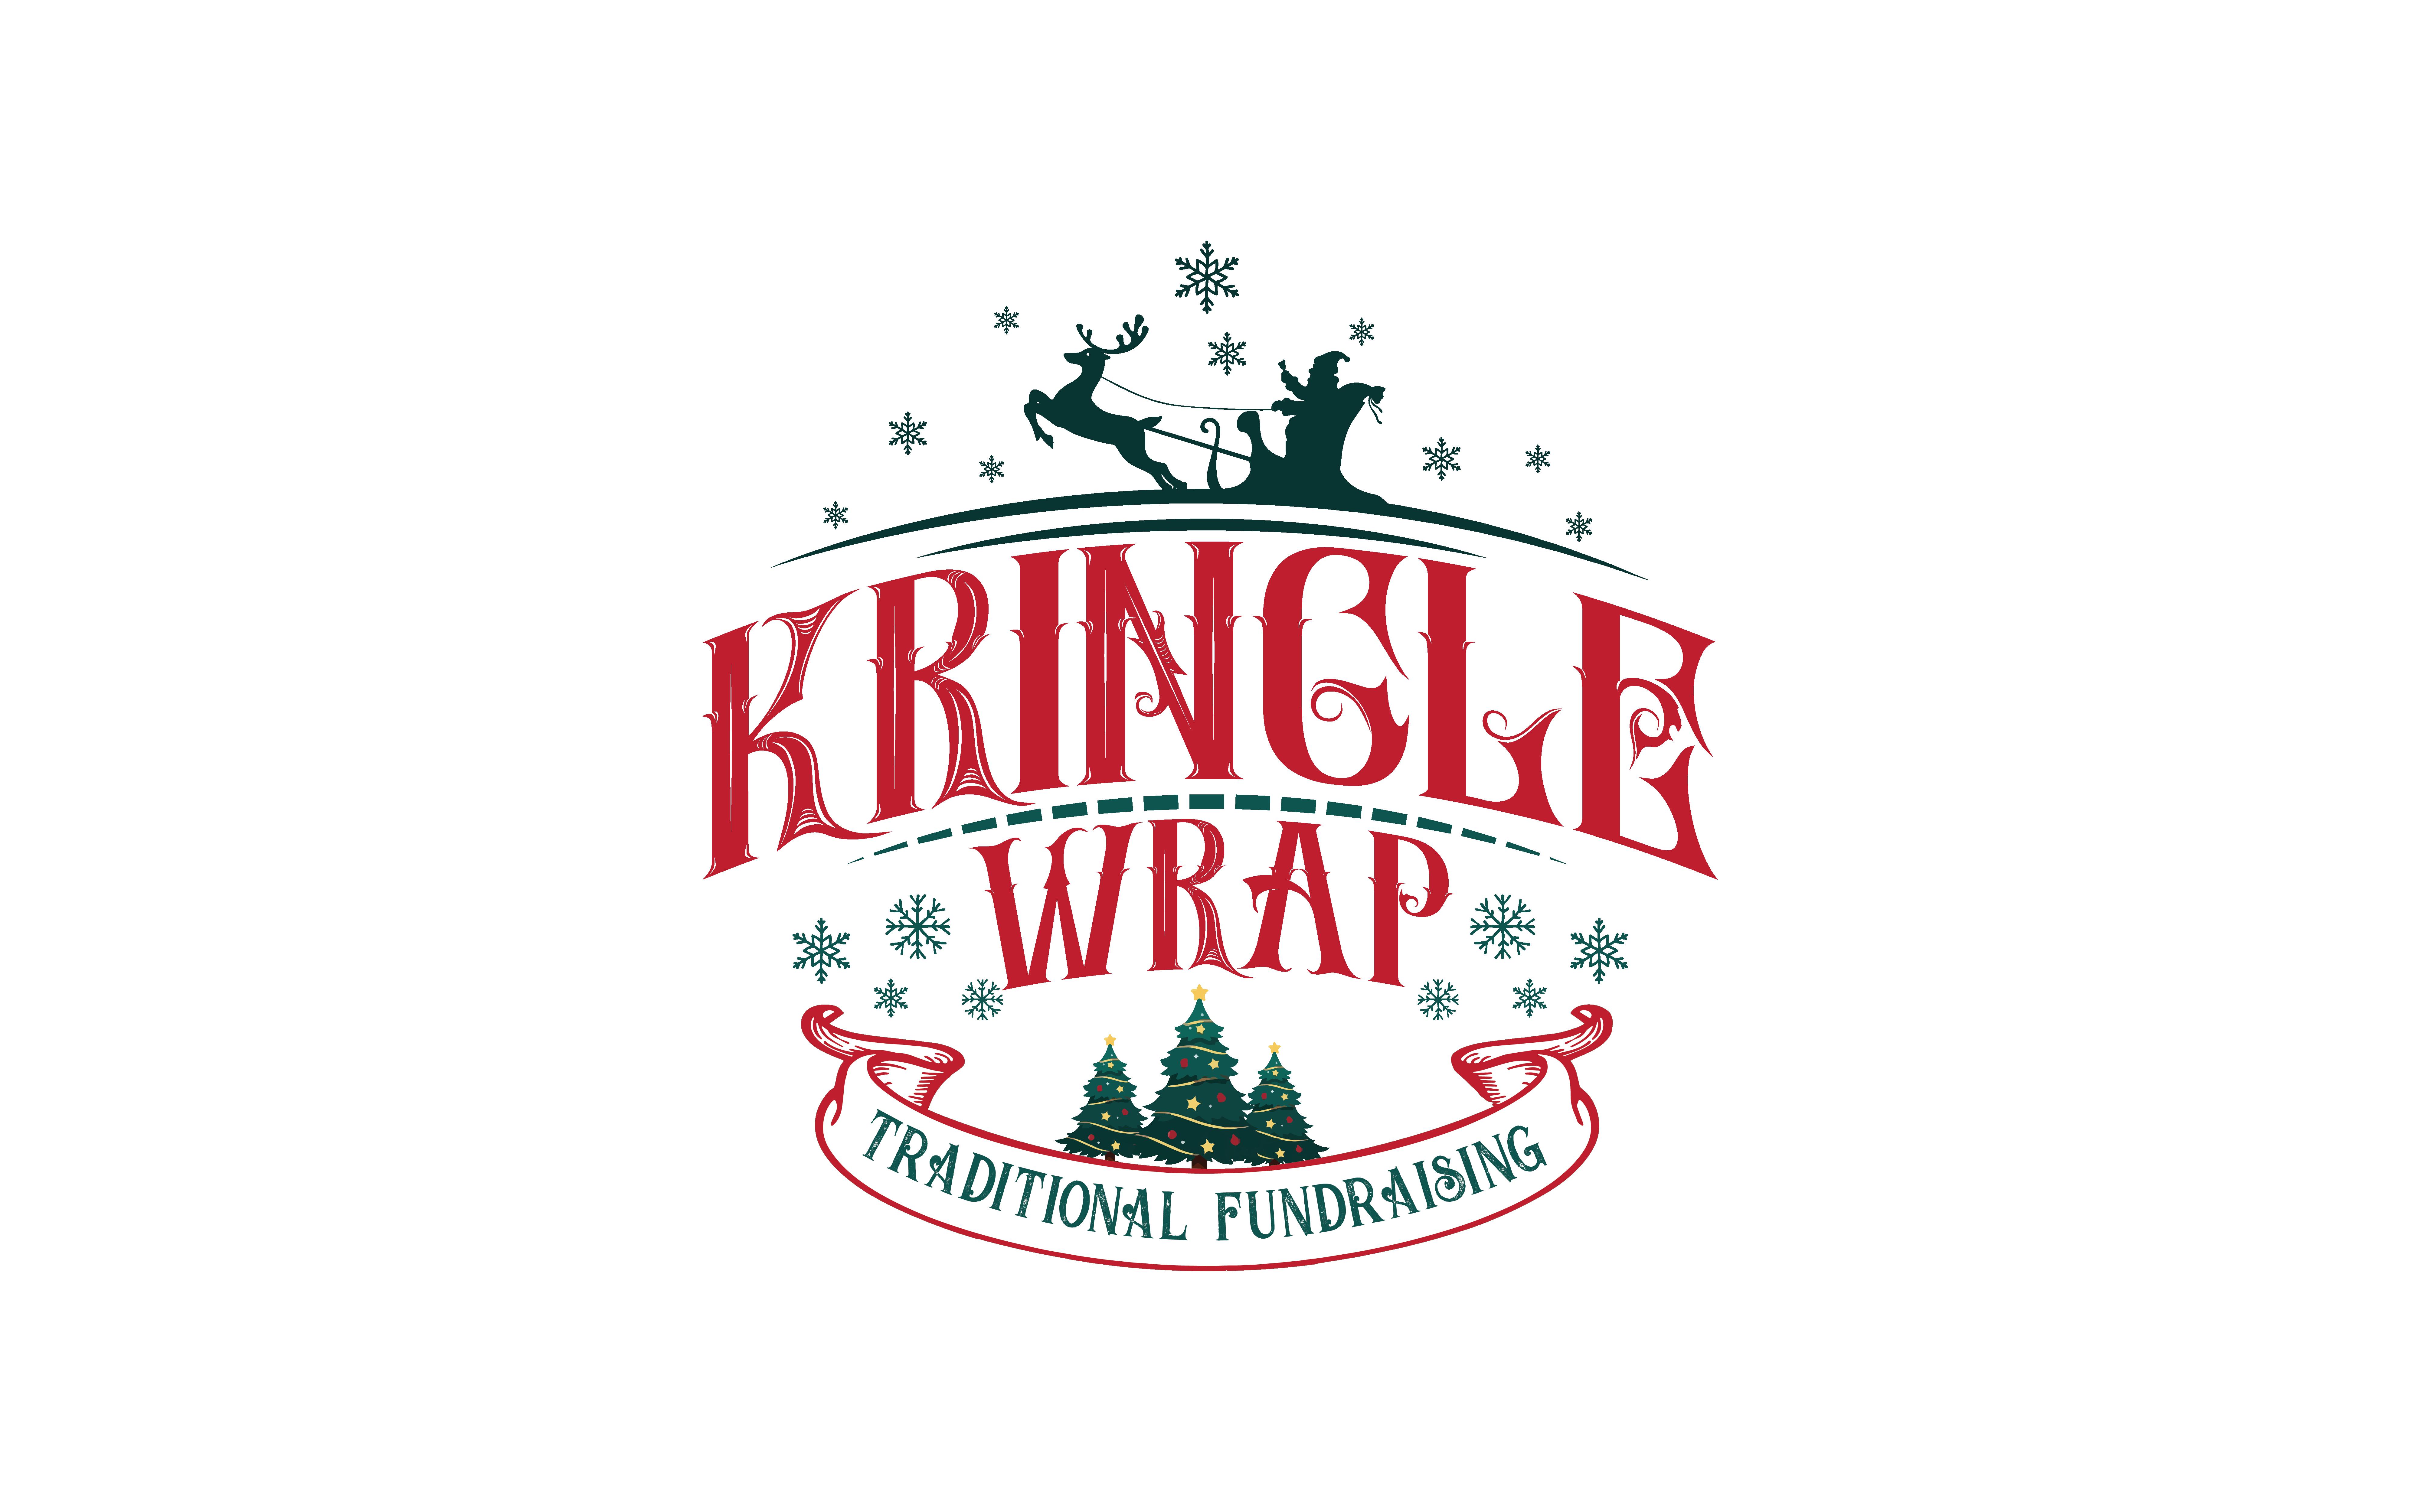 Kringle Wrap